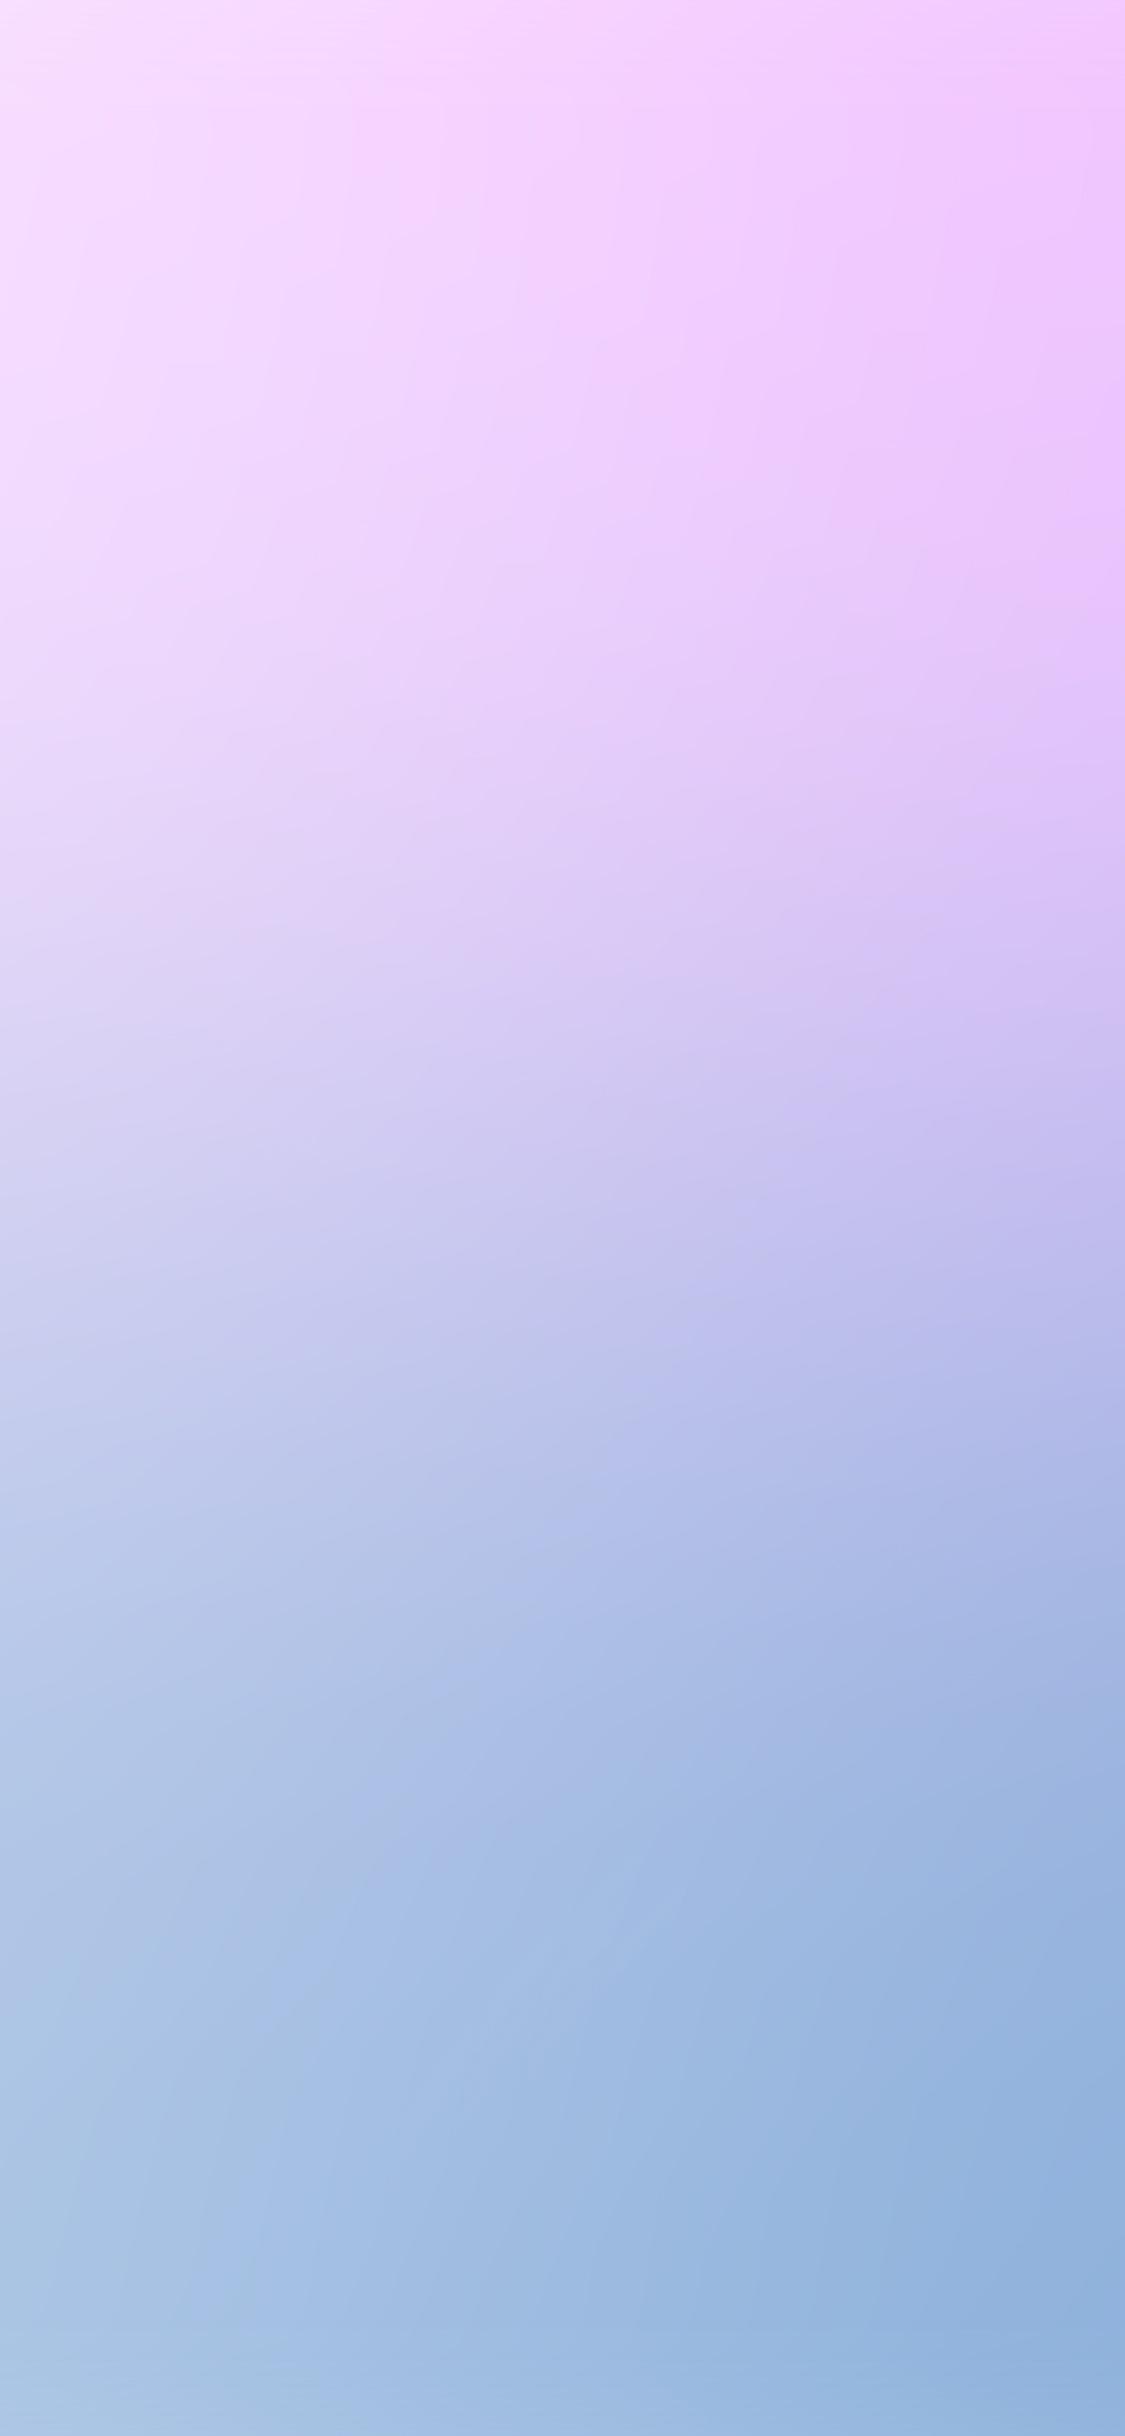 iPhoneXpapers.com-Apple-iPhone-wallpaper-sk23-dawn-morning-blue-purple-blur-gradation